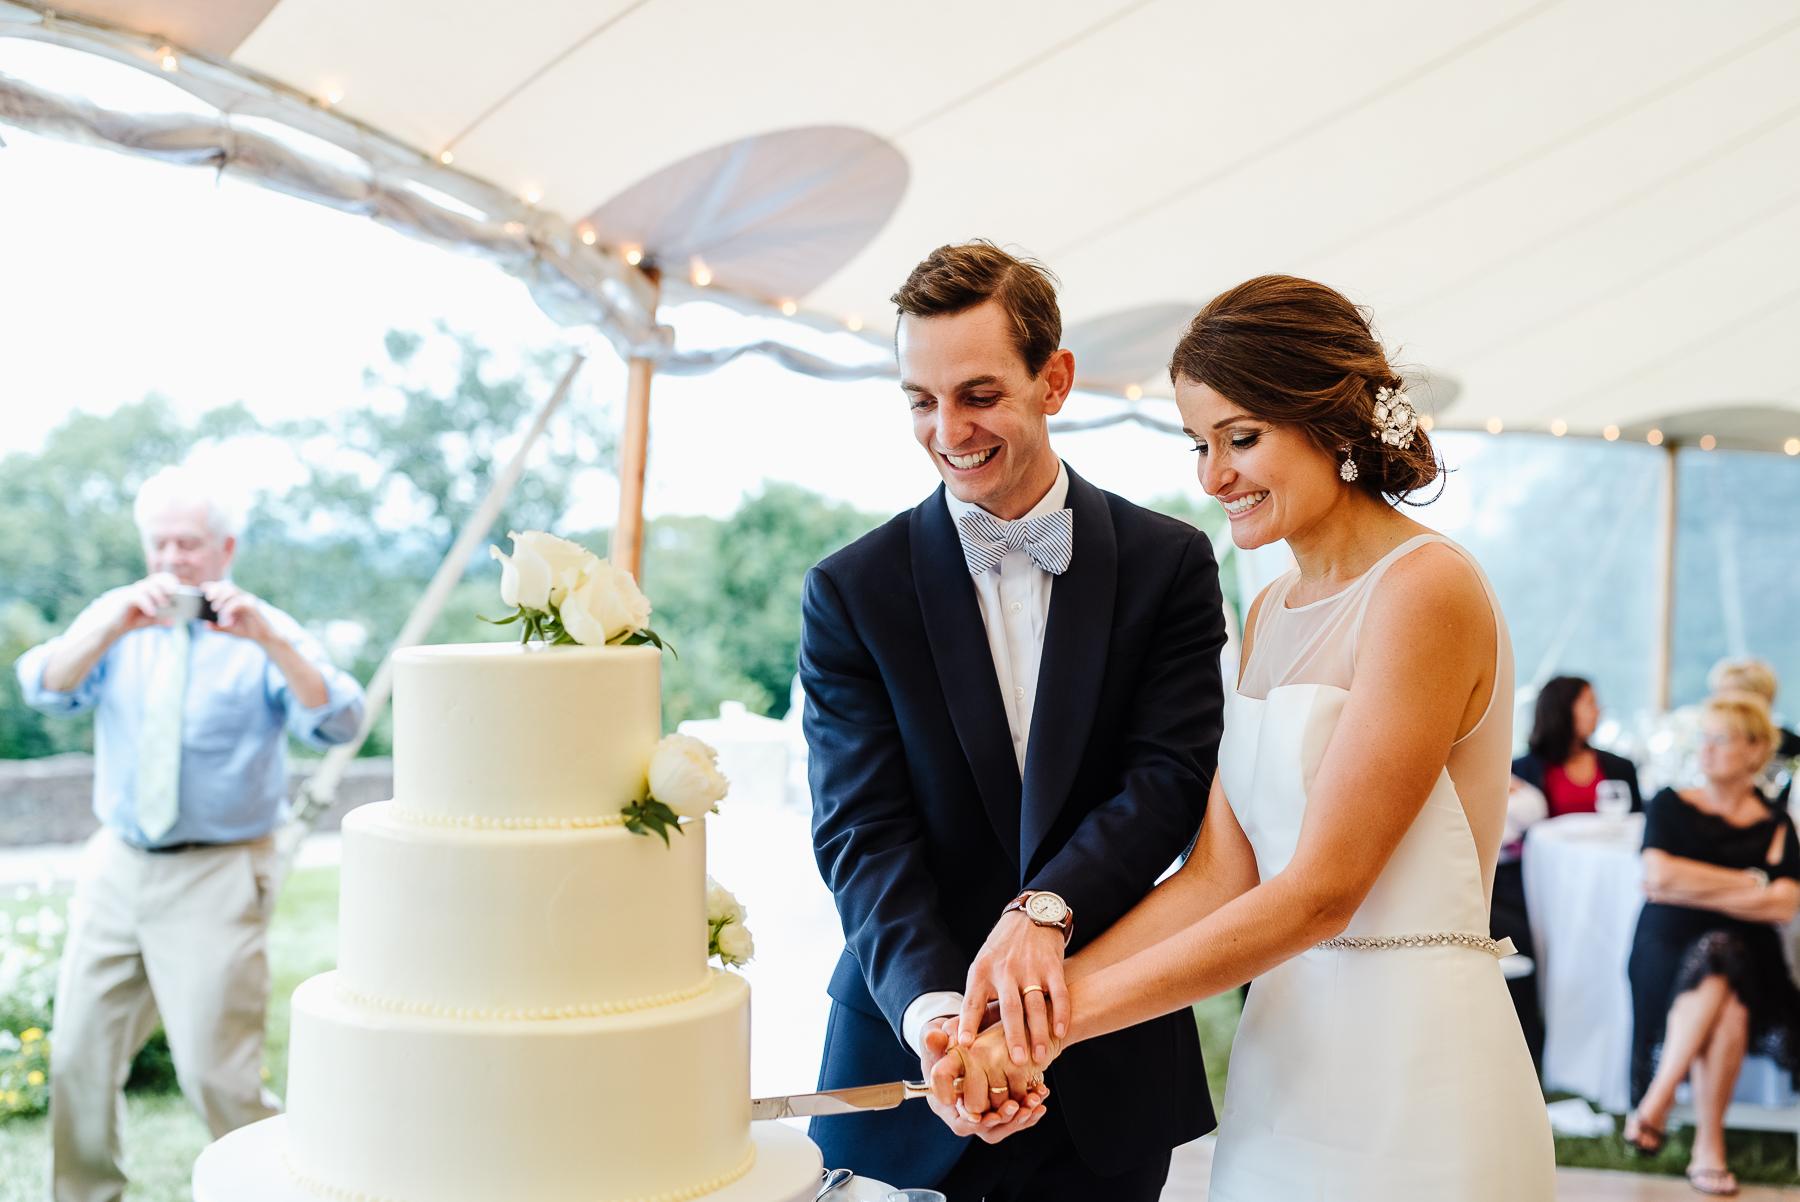 107-J Crew Wedding New Jersey Wedding Photographer J Crew Weddings.jpg